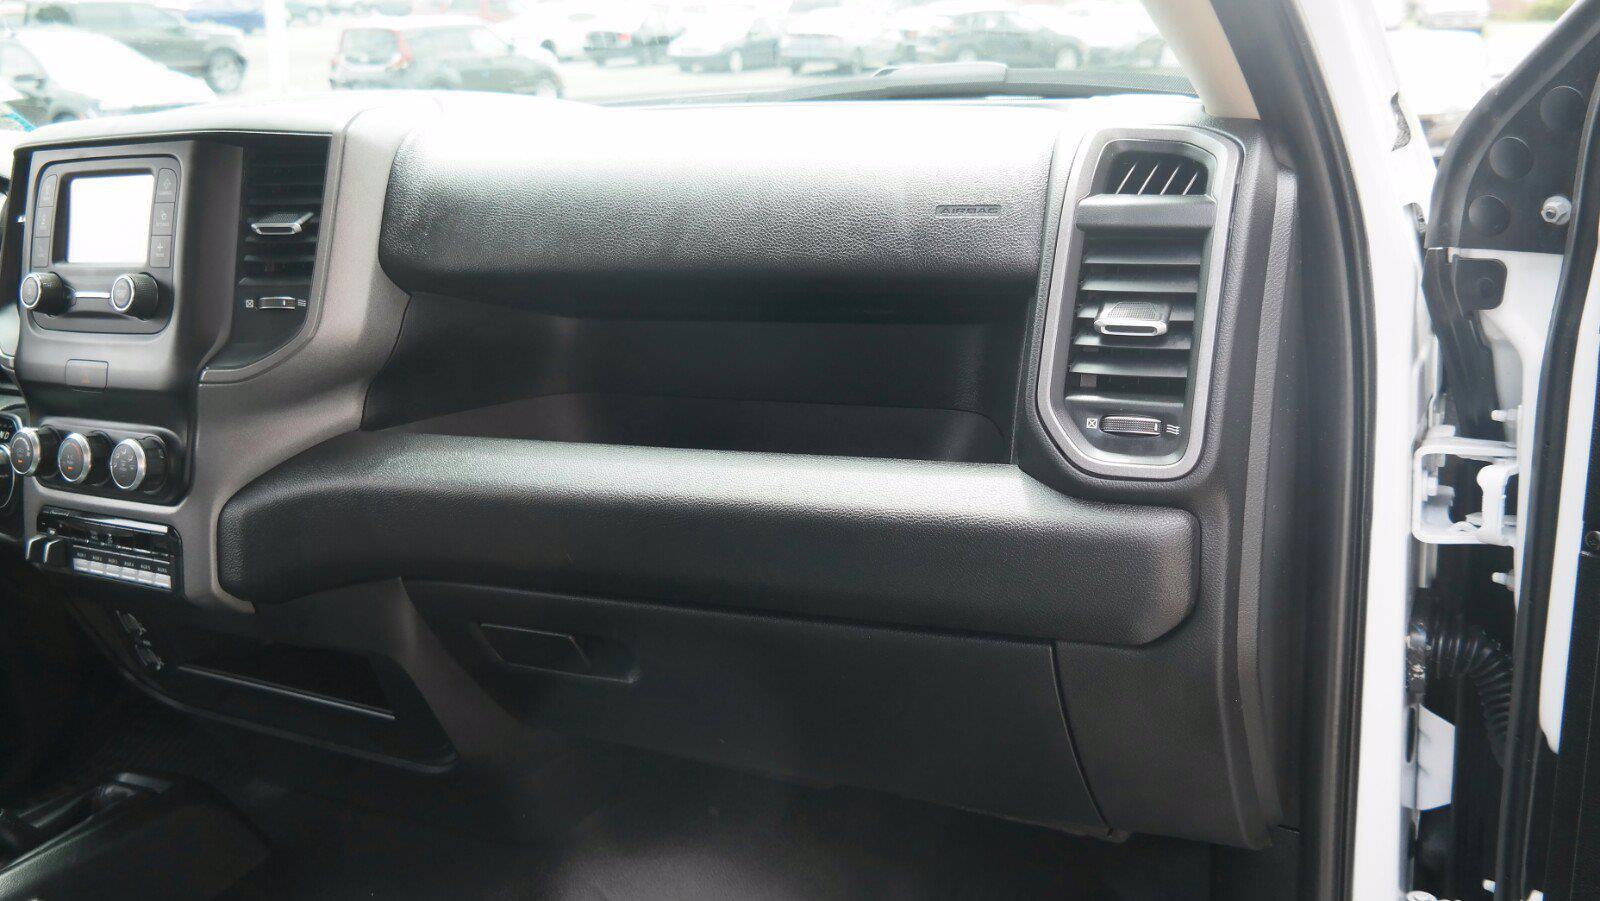 2019 Ram 2500 Regular Cab 4x4, Pickup #FLU009991 - photo 16